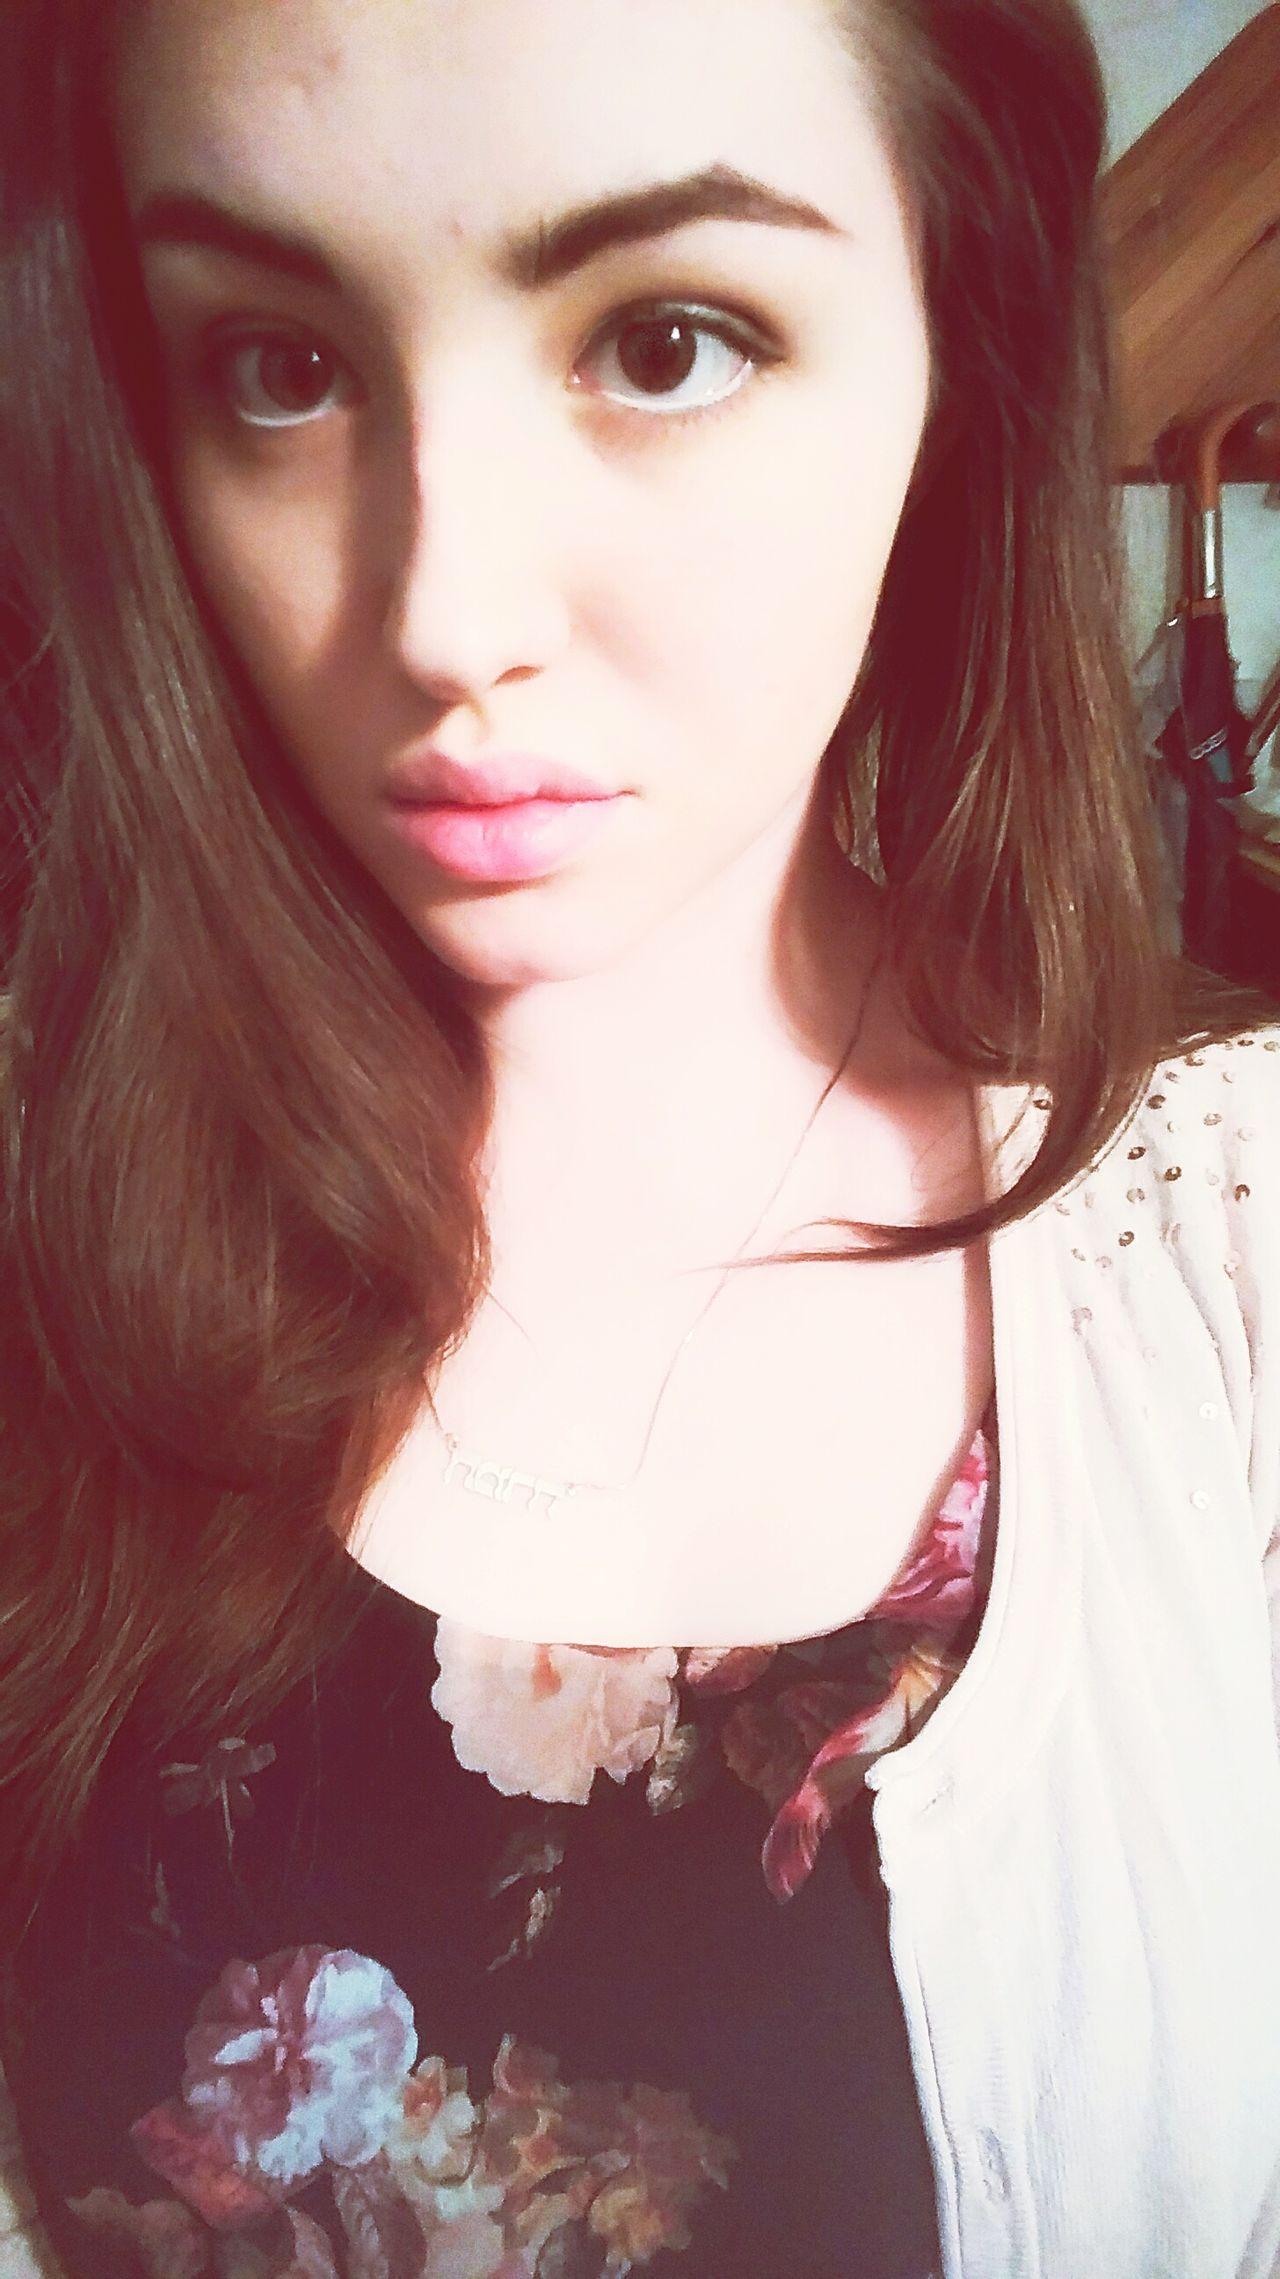 Sexy♡ Hottie EyeEmGIRLS EyeemSelfie Doyoulikeit? Portrait Of A Woman Eyeemgirl Czechgirl Pretty Girl Sexywomen Followme SexyAsFuck Beautiful Beauty Hot_shotz EyeEm Girl Of The Day SexyGirl.♥ Hottie Girl Hotties Sexylips